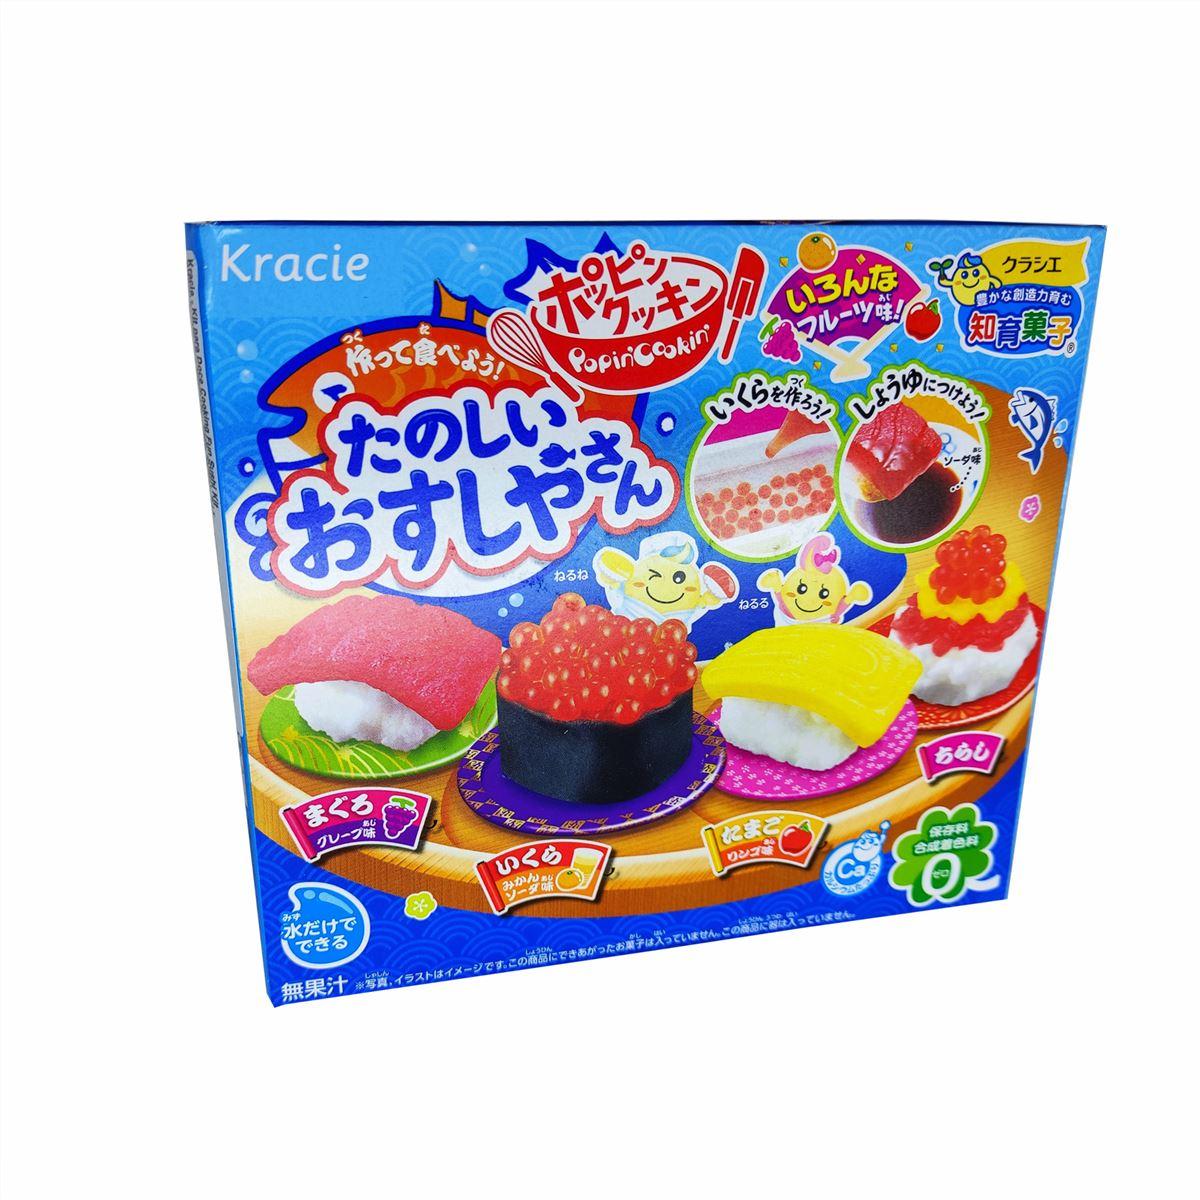 Kit p/ Doce Japonês Happy Cooking Fun Sushi 28,5g - Kracie